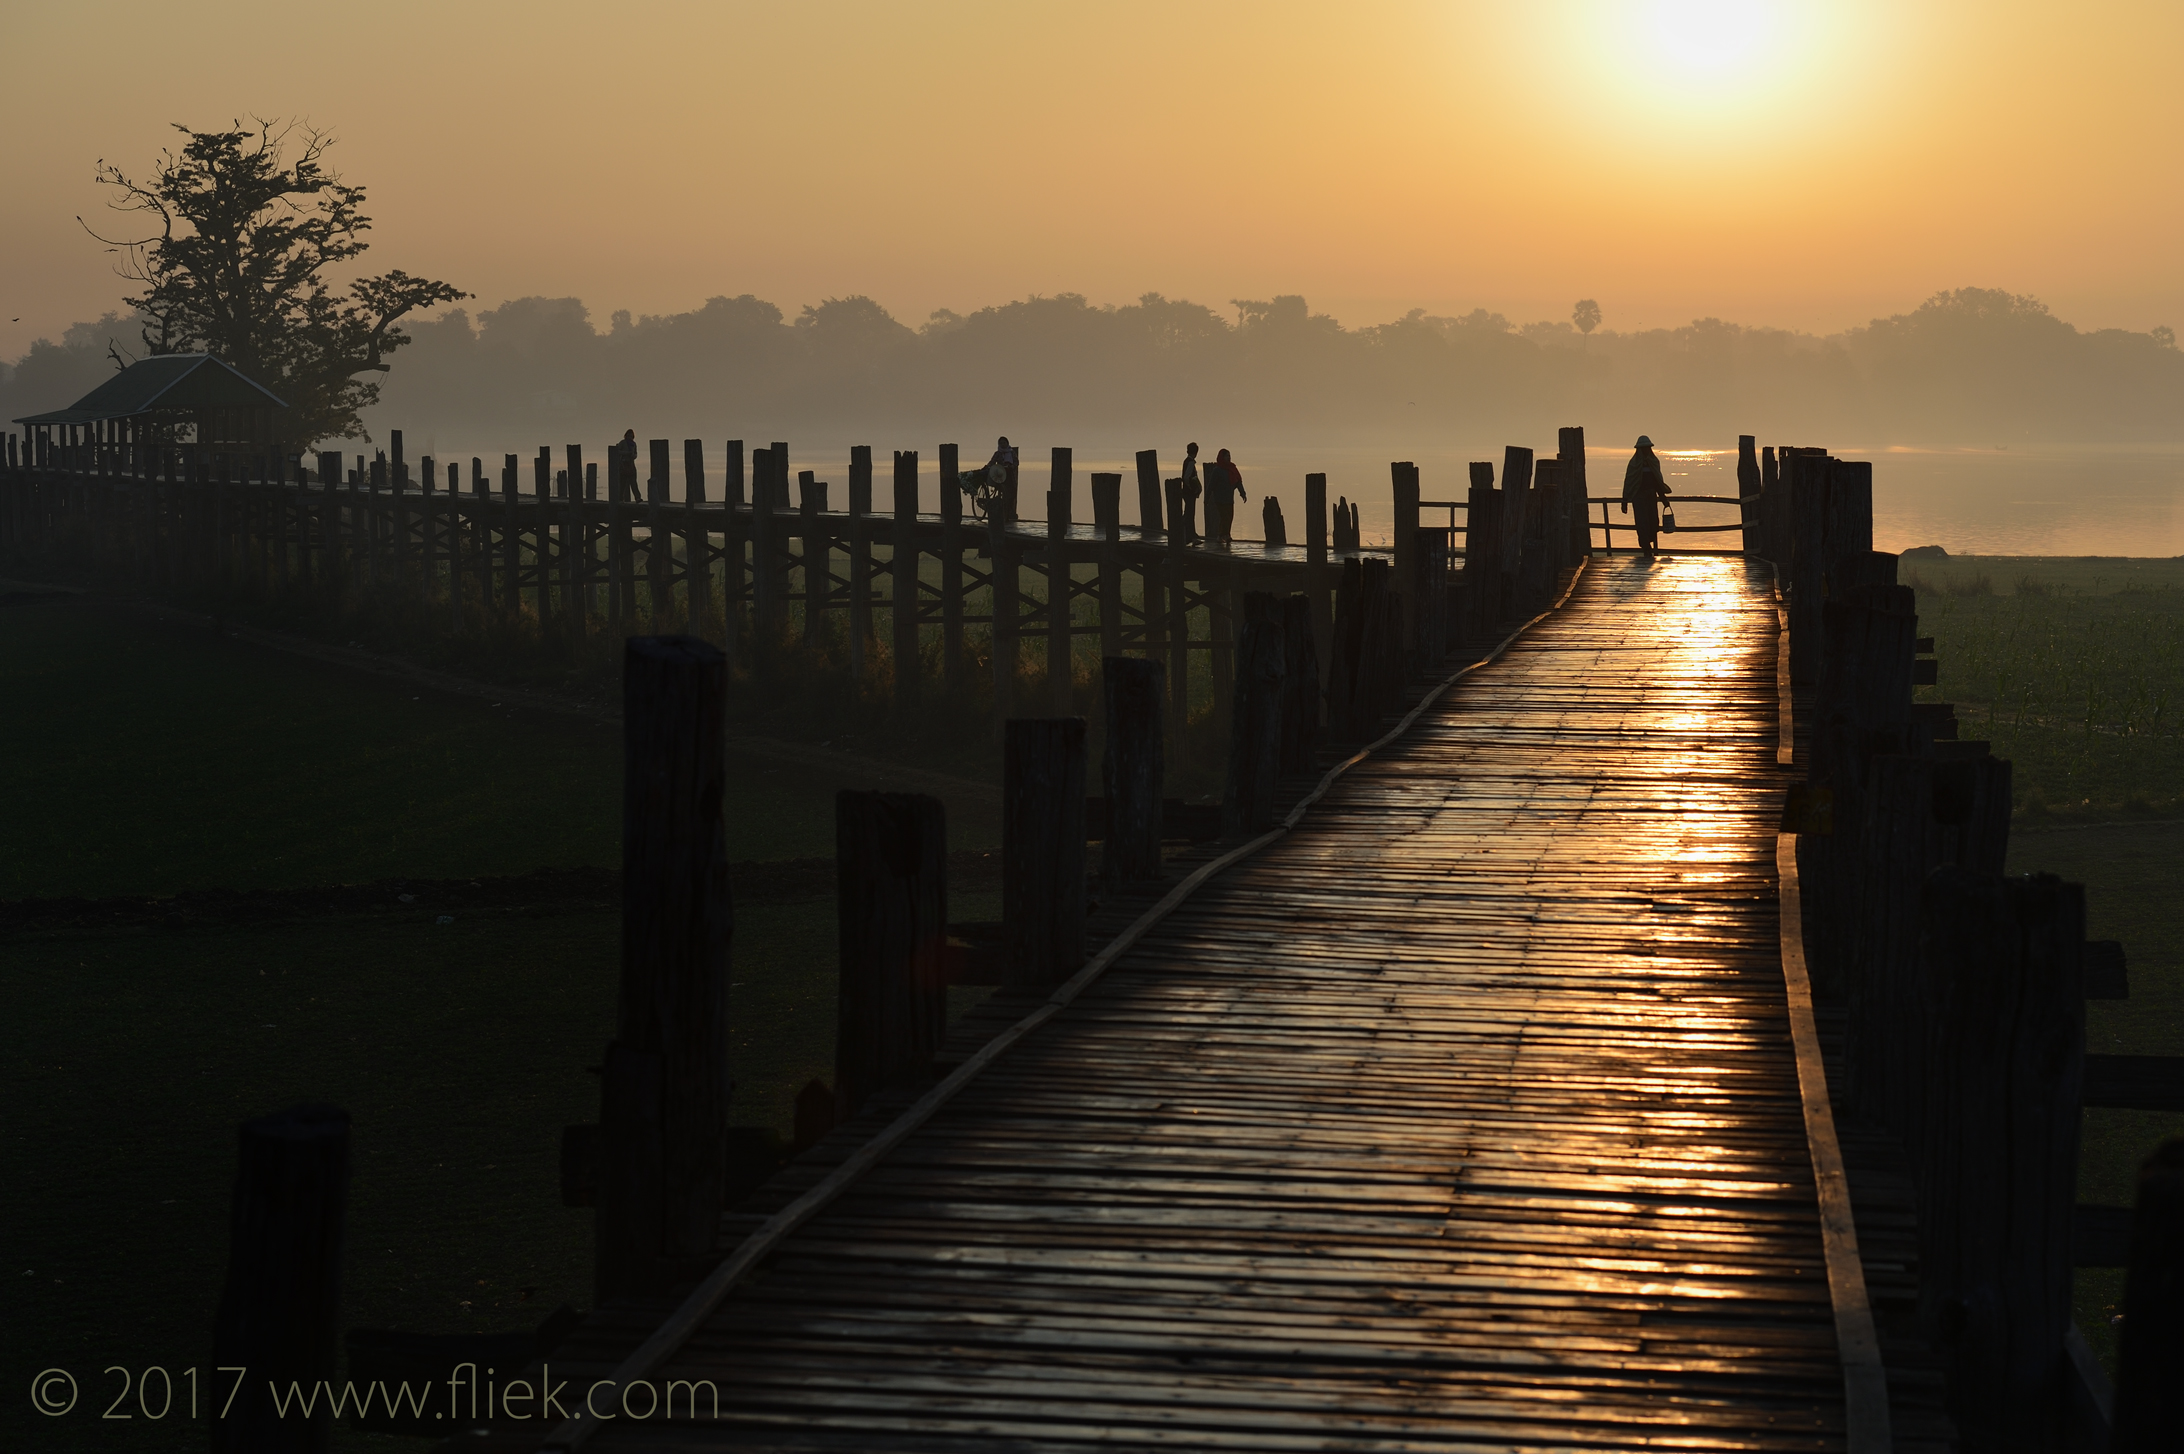 Magical mysterious Myanmar...<br><i> Mandalay U-bein bridge sunrise